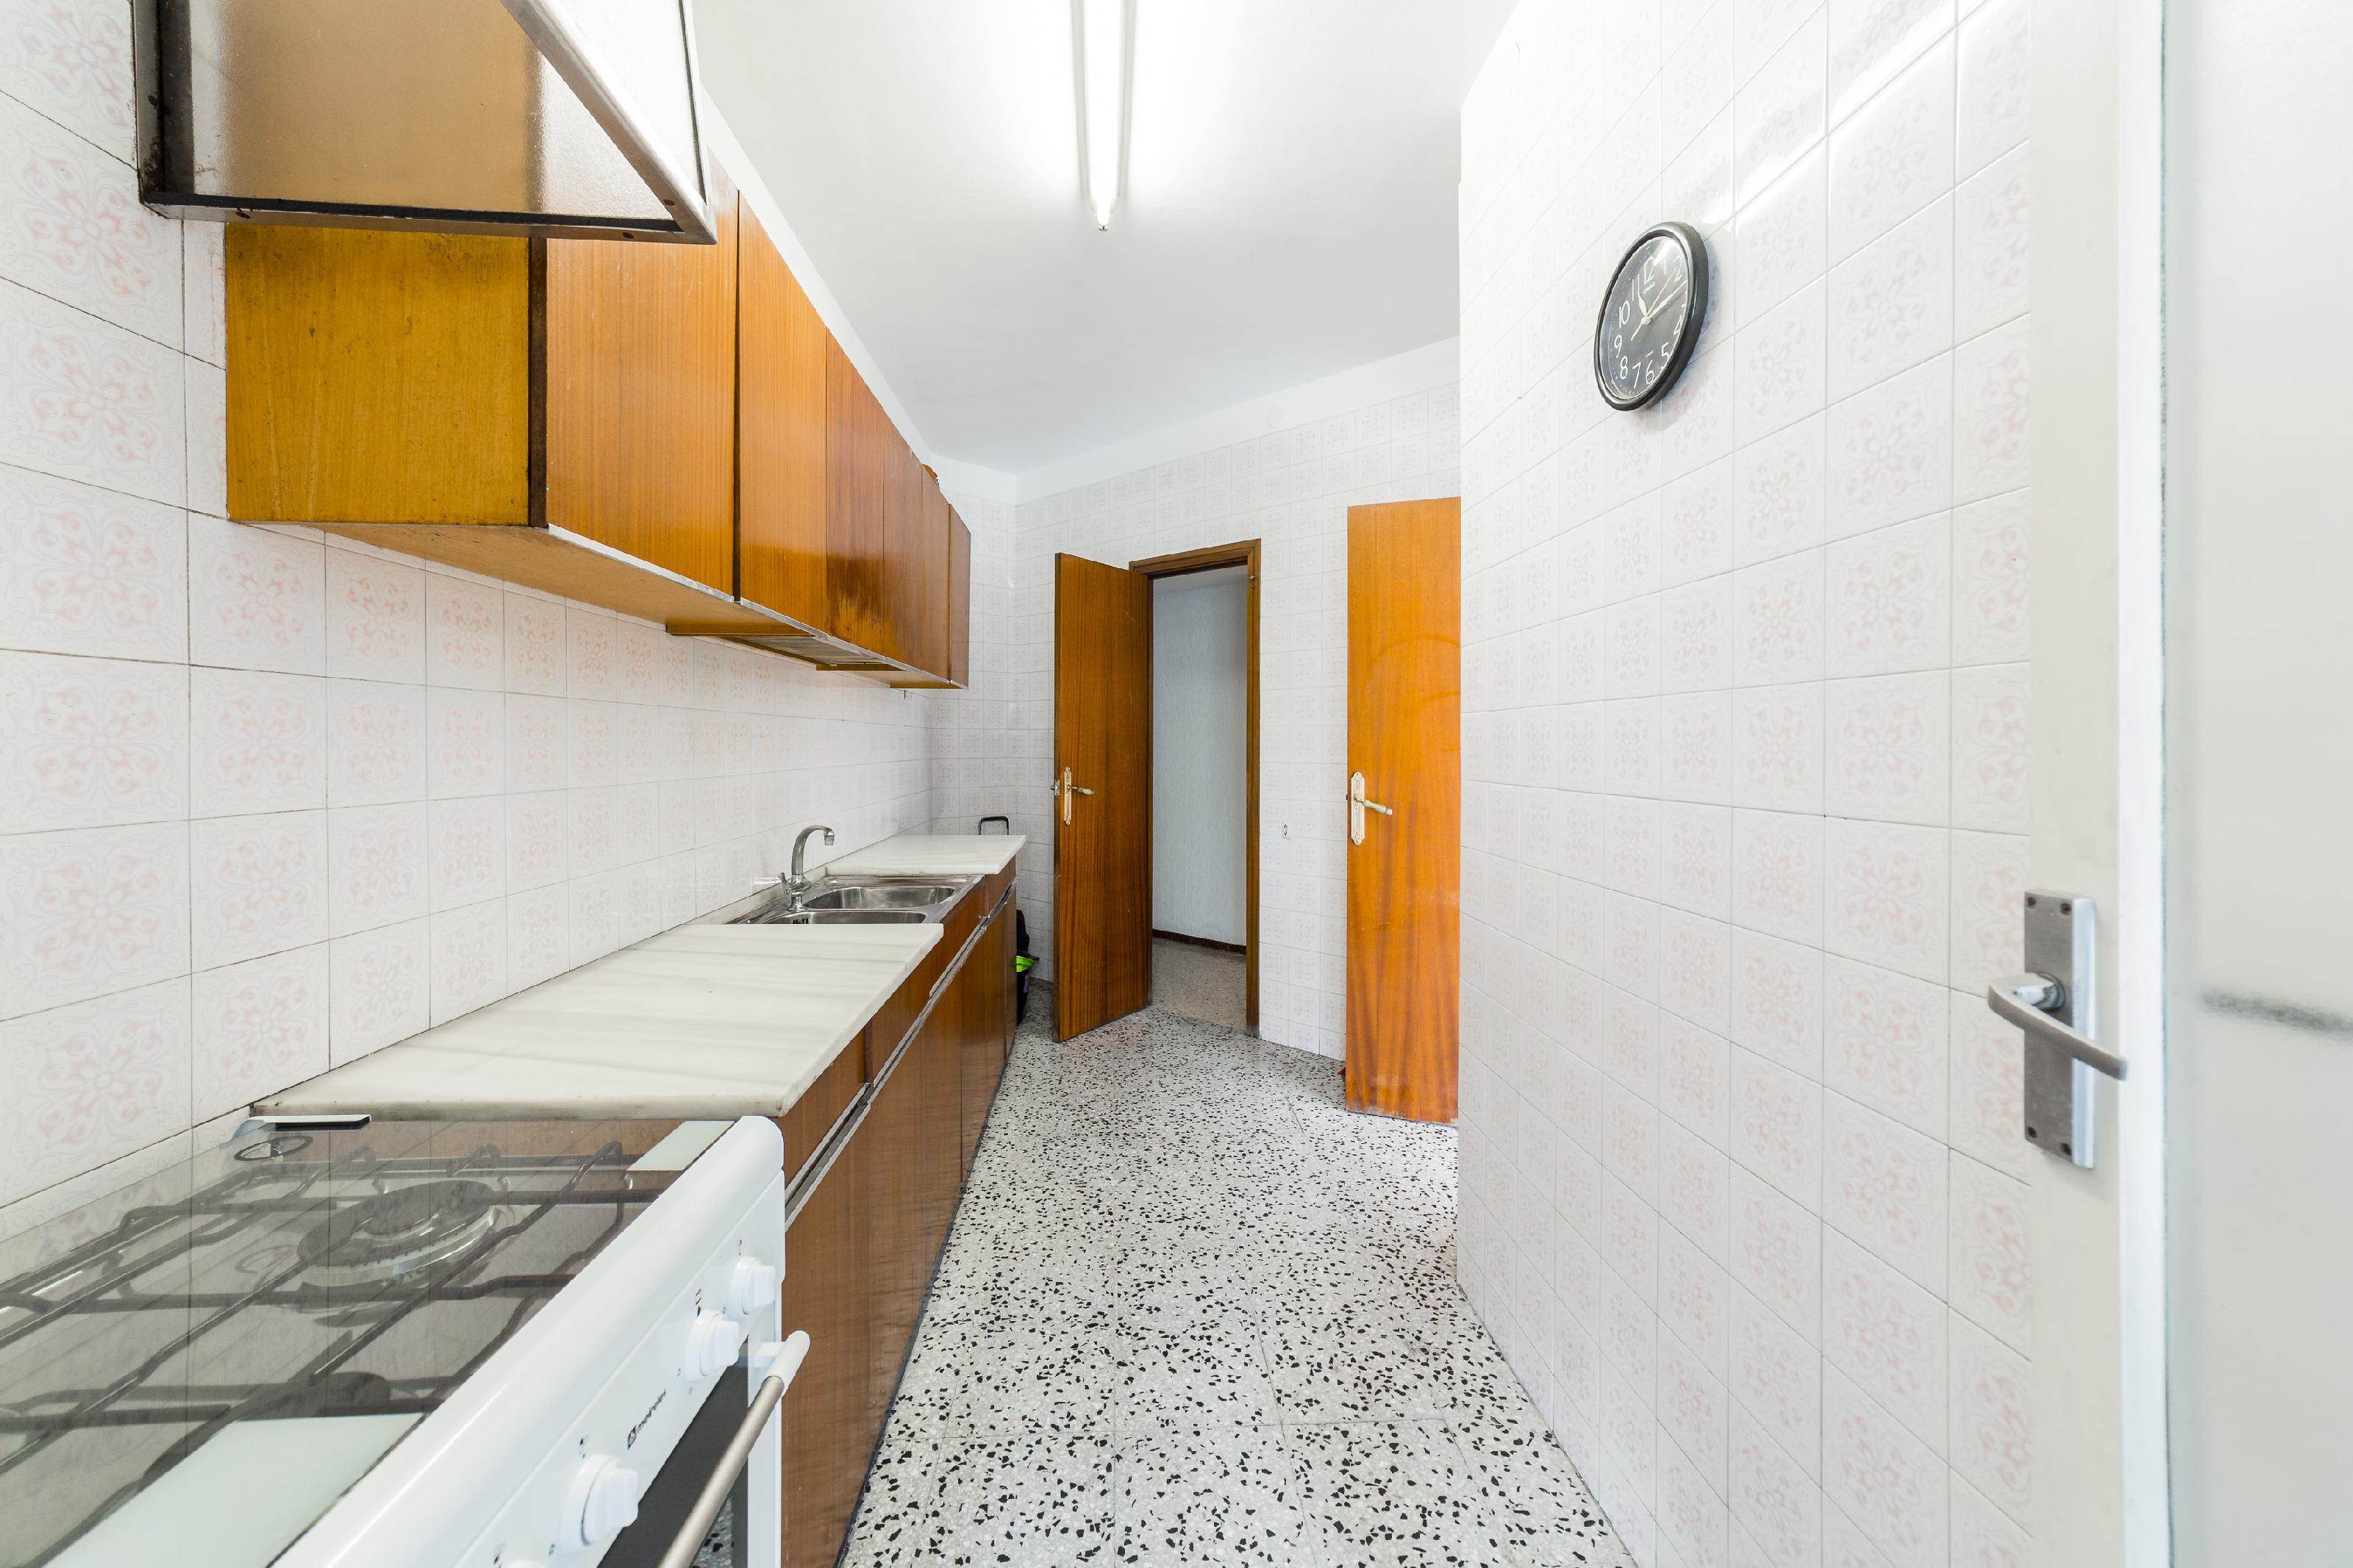 247624 Flat for sale in Eixample, Sant Antoni 11